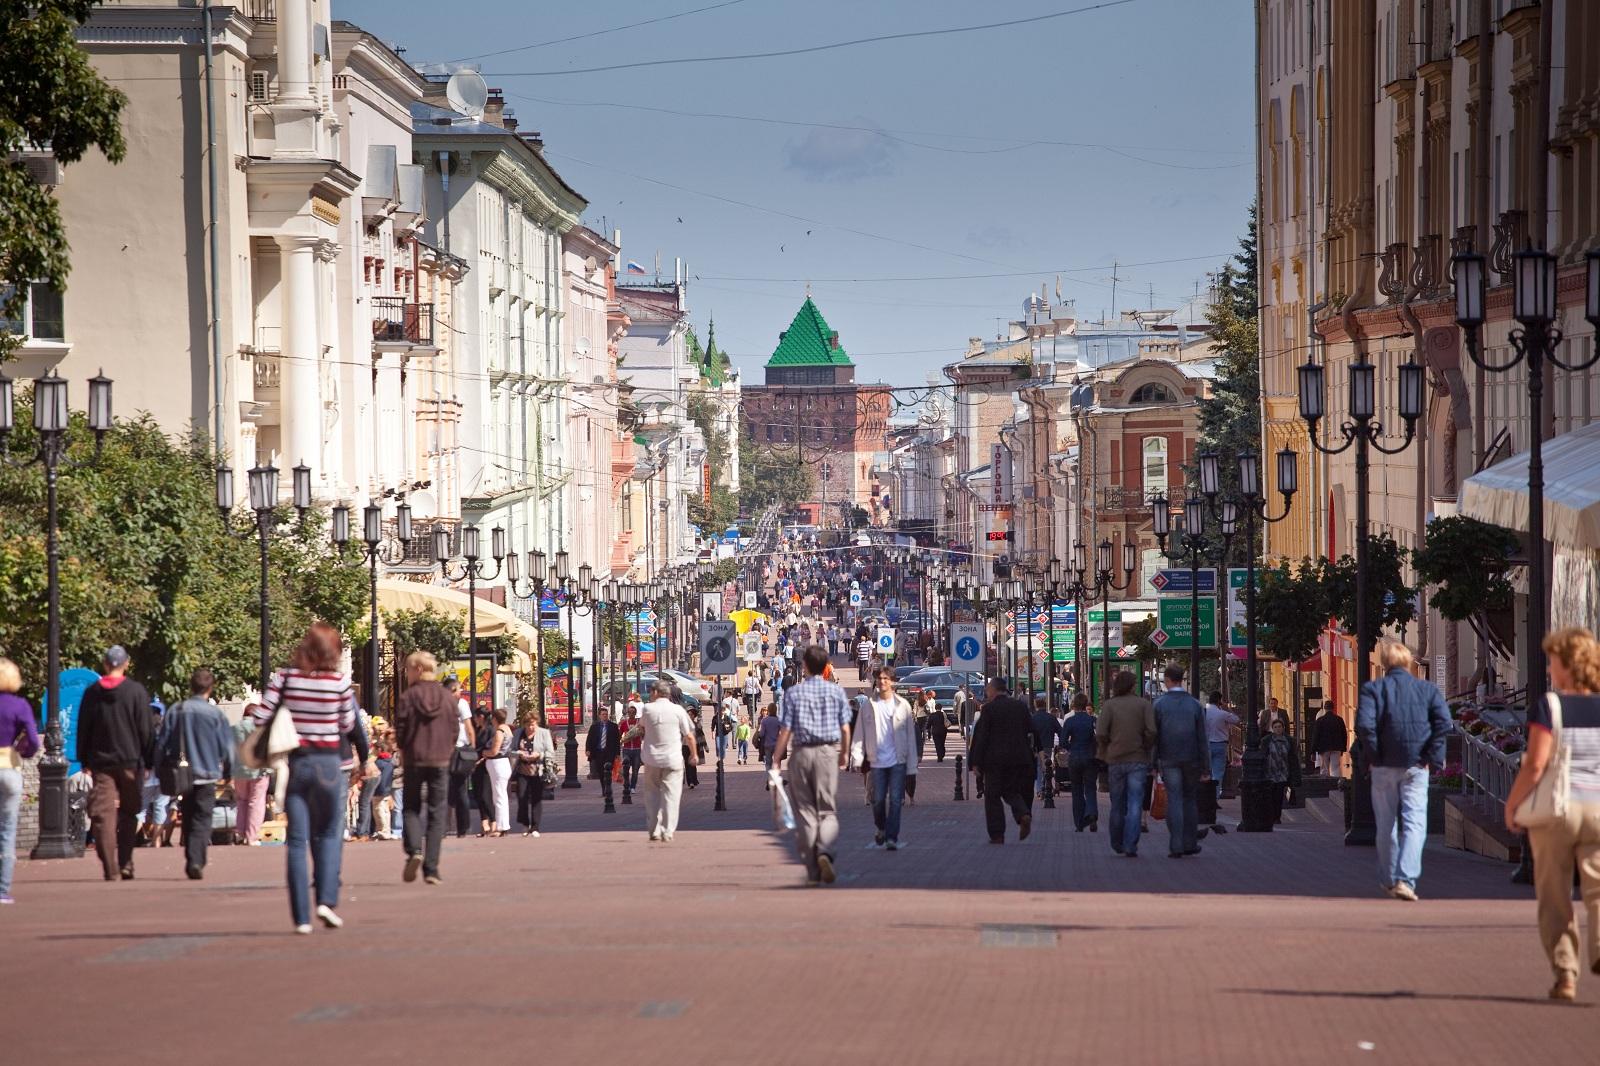 Bolshaya_Pokrovskaya_Street_2-kilometer_long_pedestrian_street_a_favorite_spot_with_locals_and_visitors.jpg